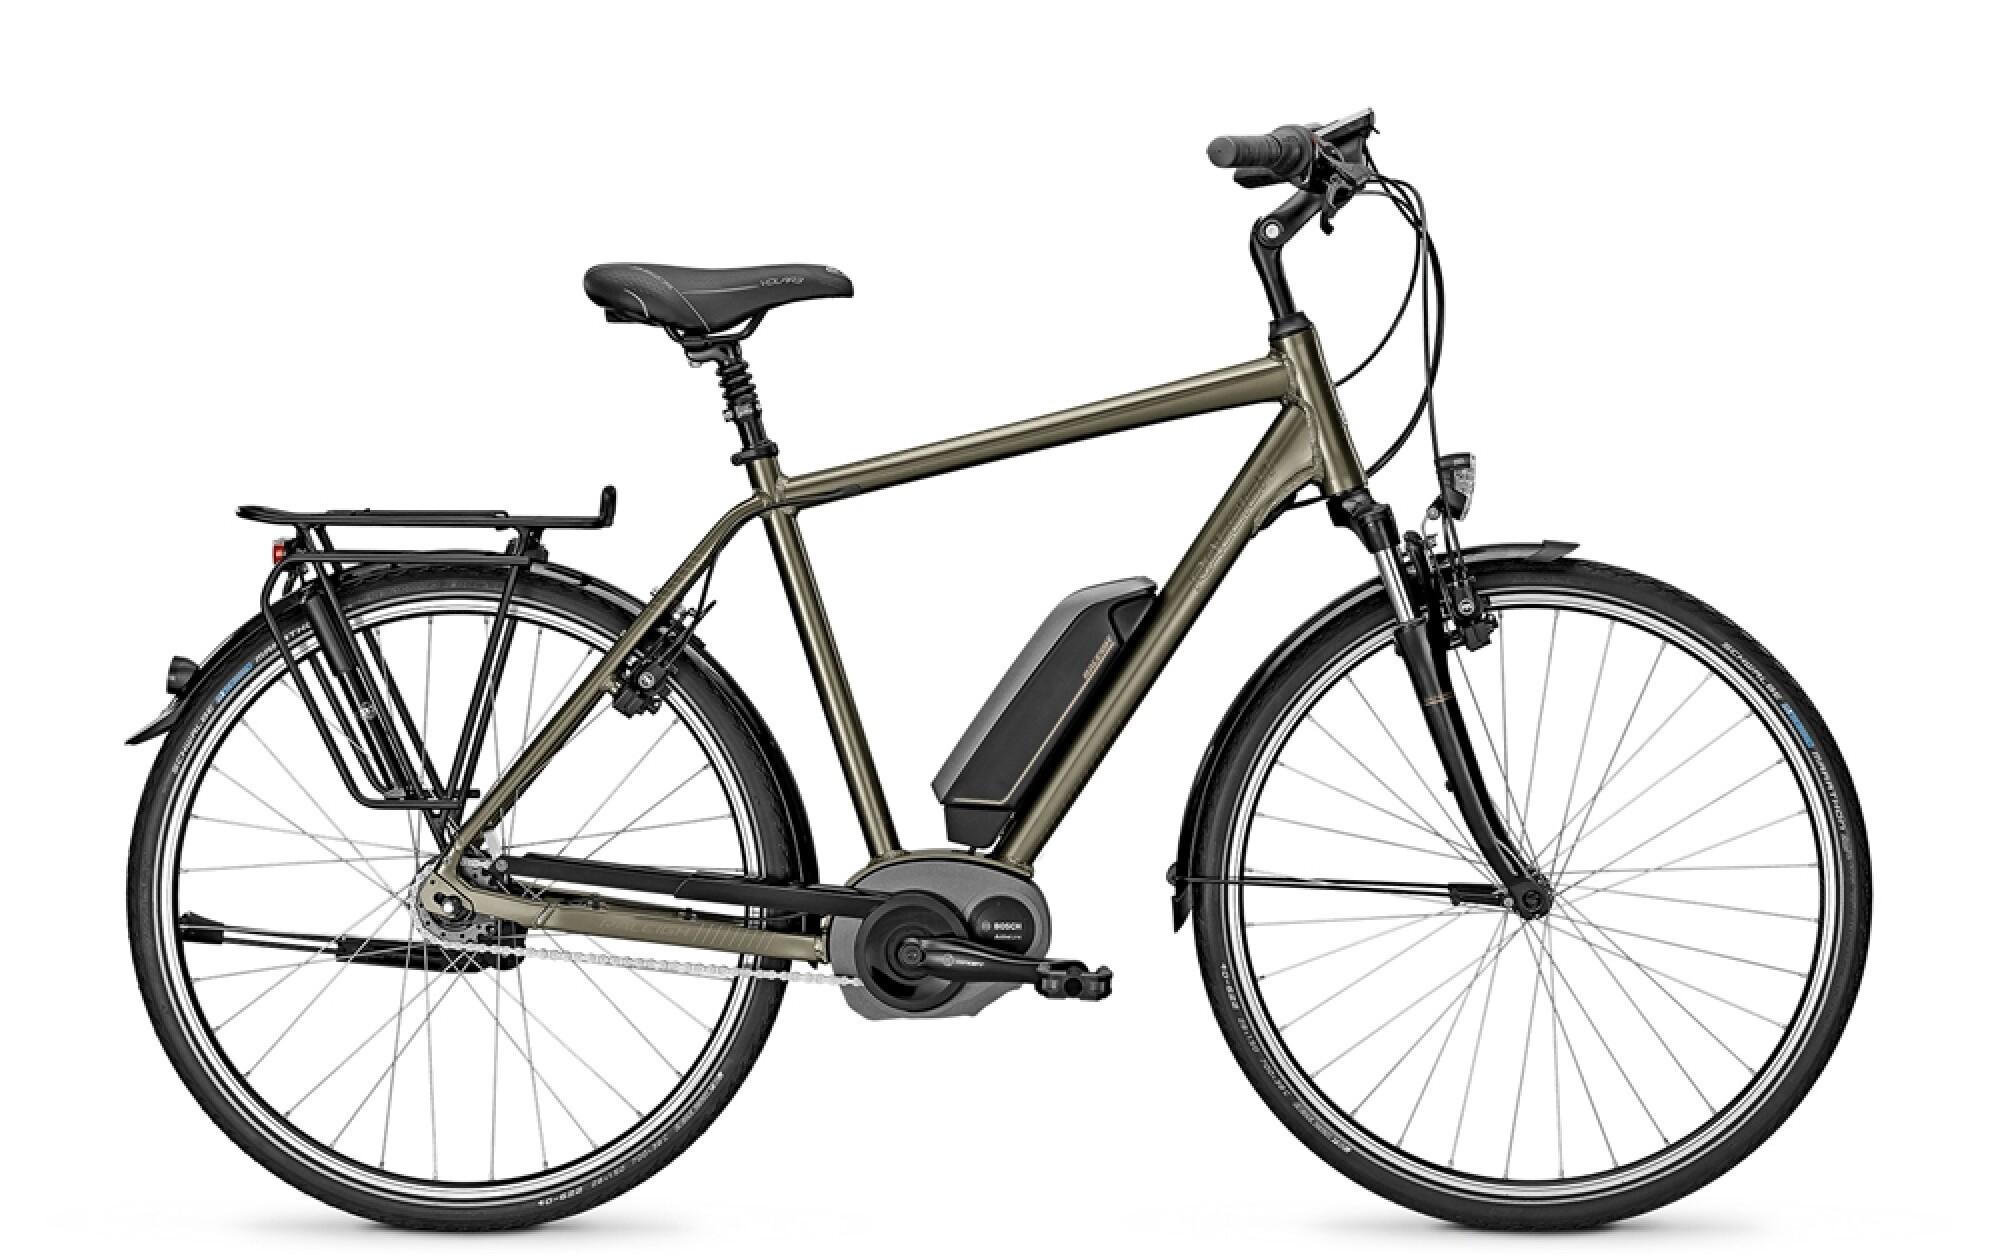 e bike raleigh cardiff b8 b8r 2016 bei alle. Black Bedroom Furniture Sets. Home Design Ideas